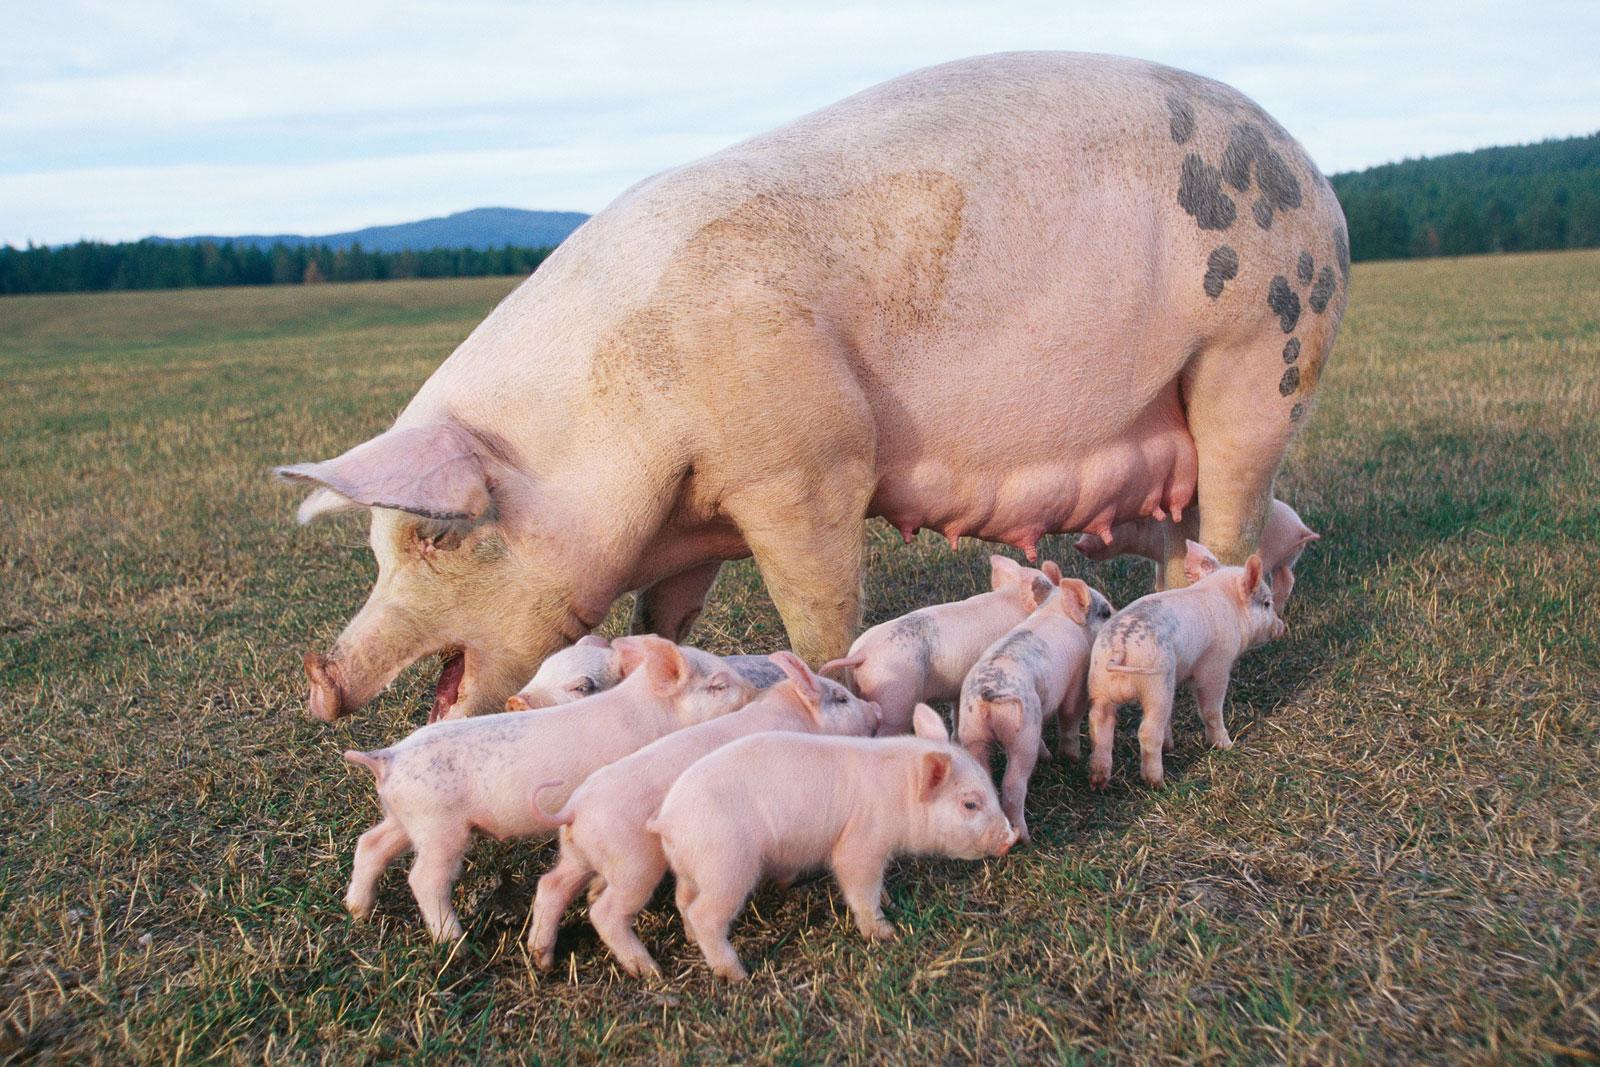 Momma Pig And Piglets Wallpaper 1600 X 1067 197194 HD 1600x1067